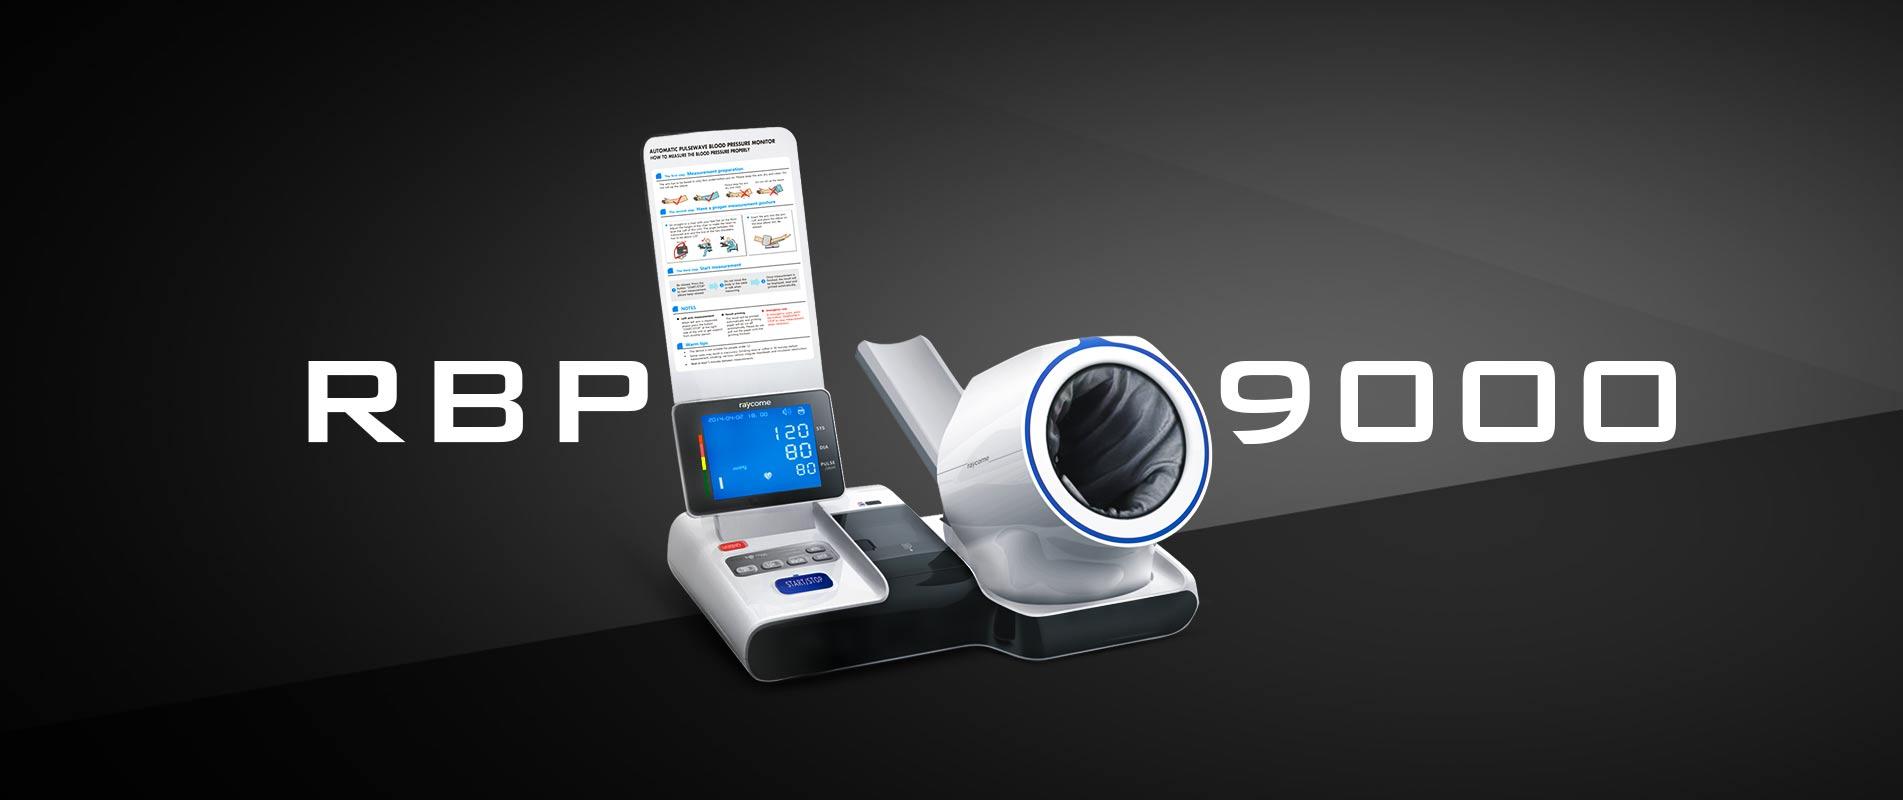 Raycom RBP 9000 blood pressure machine